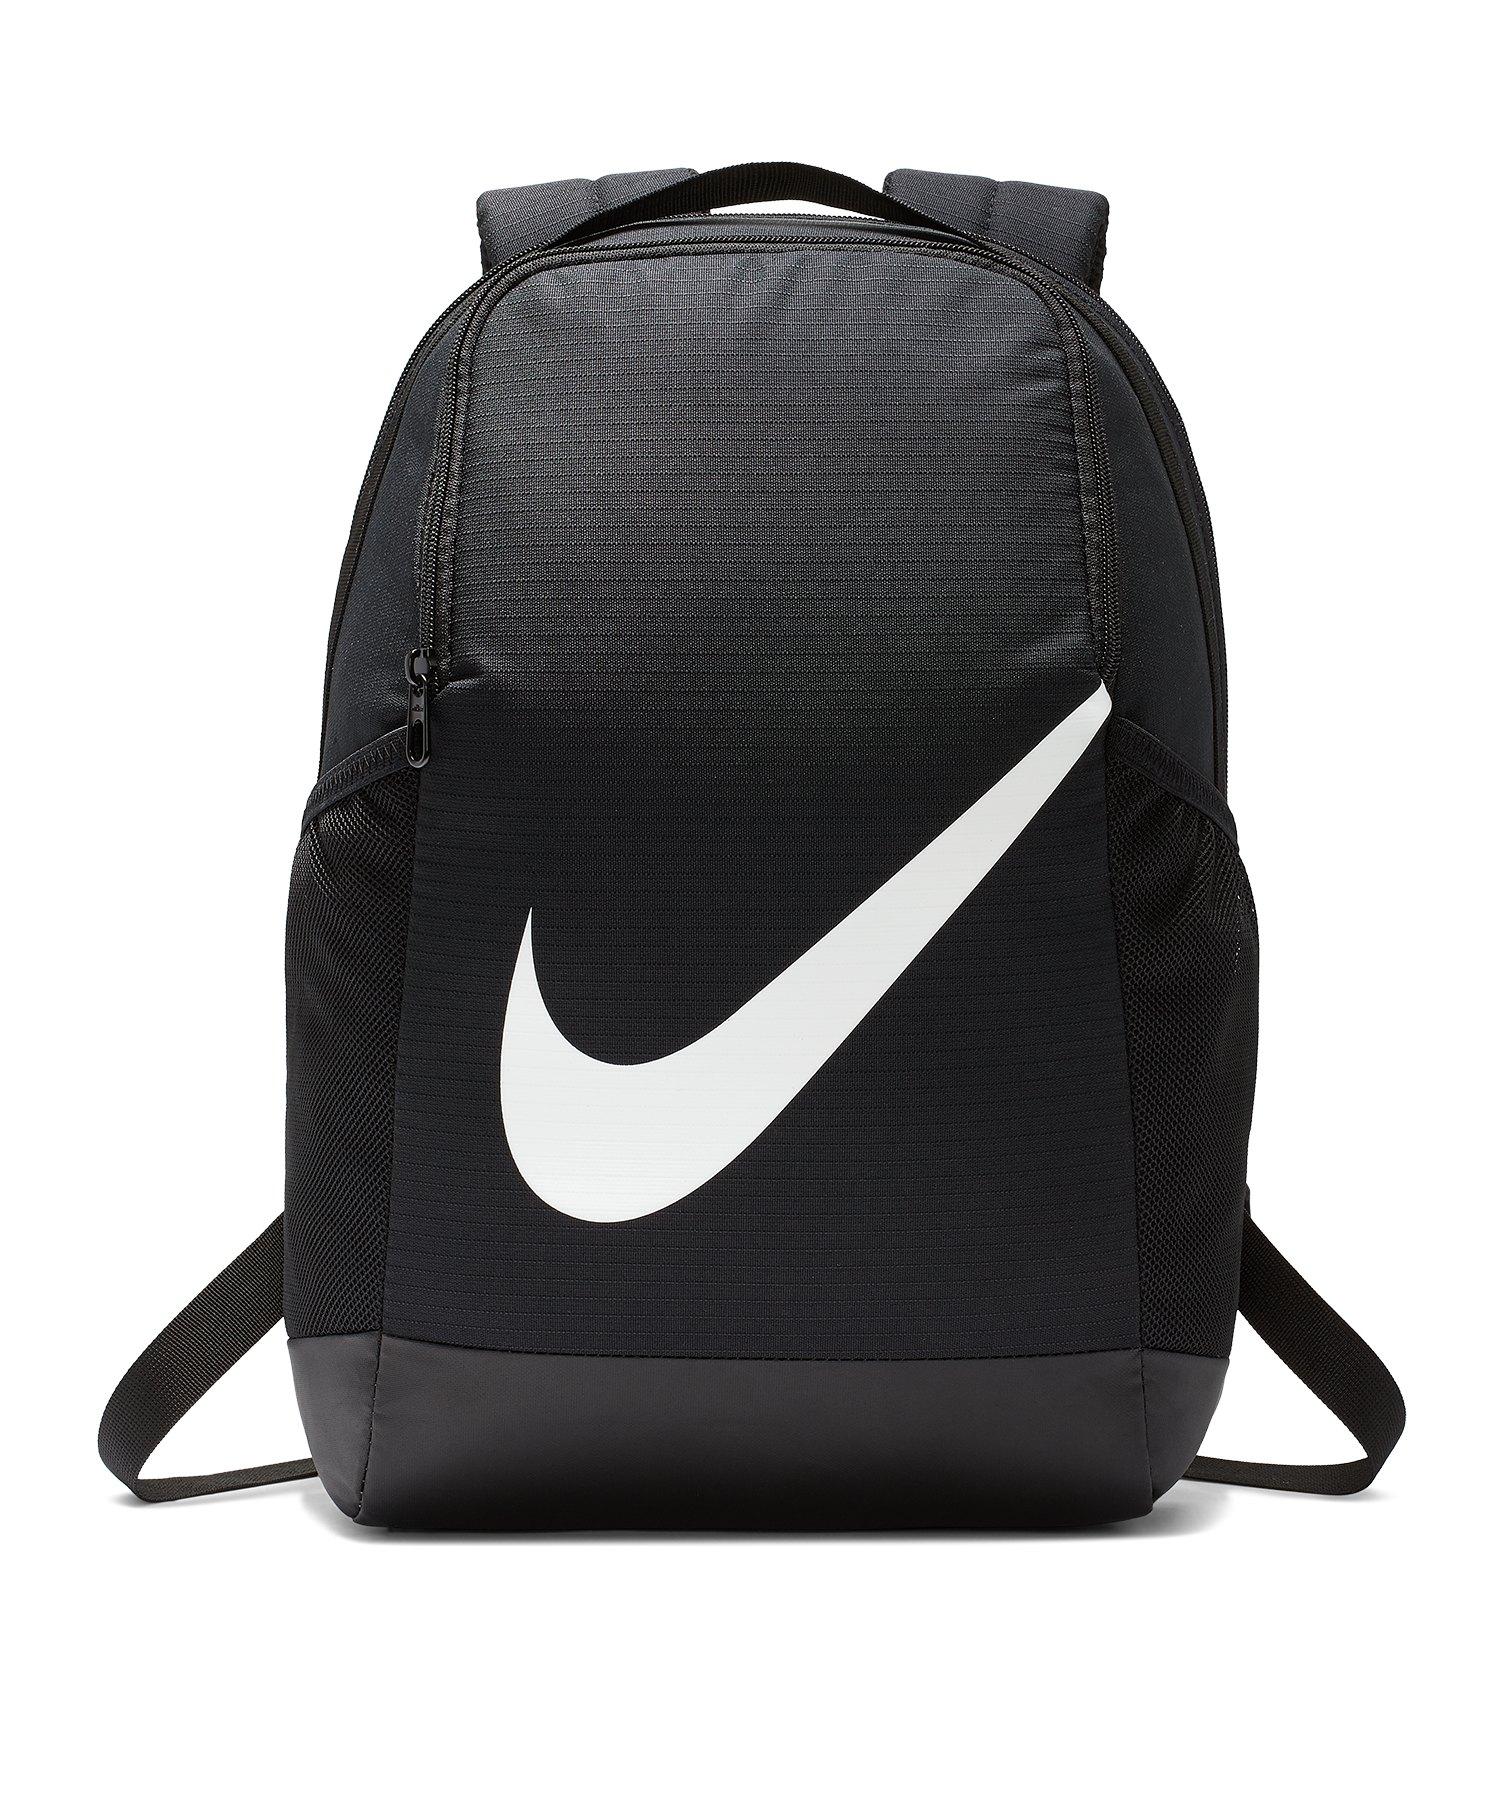 Nike Brasilia Backpack Rucksack Kids Schwarz F010 - schwarz